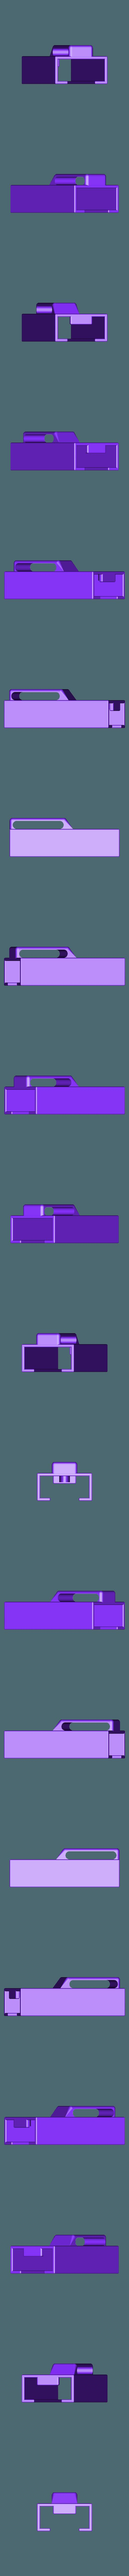 DremelMultitoolPliersHolster.stl Download free STL file Dremel Multitool Pliers Holster • 3D printer design, 3DWP